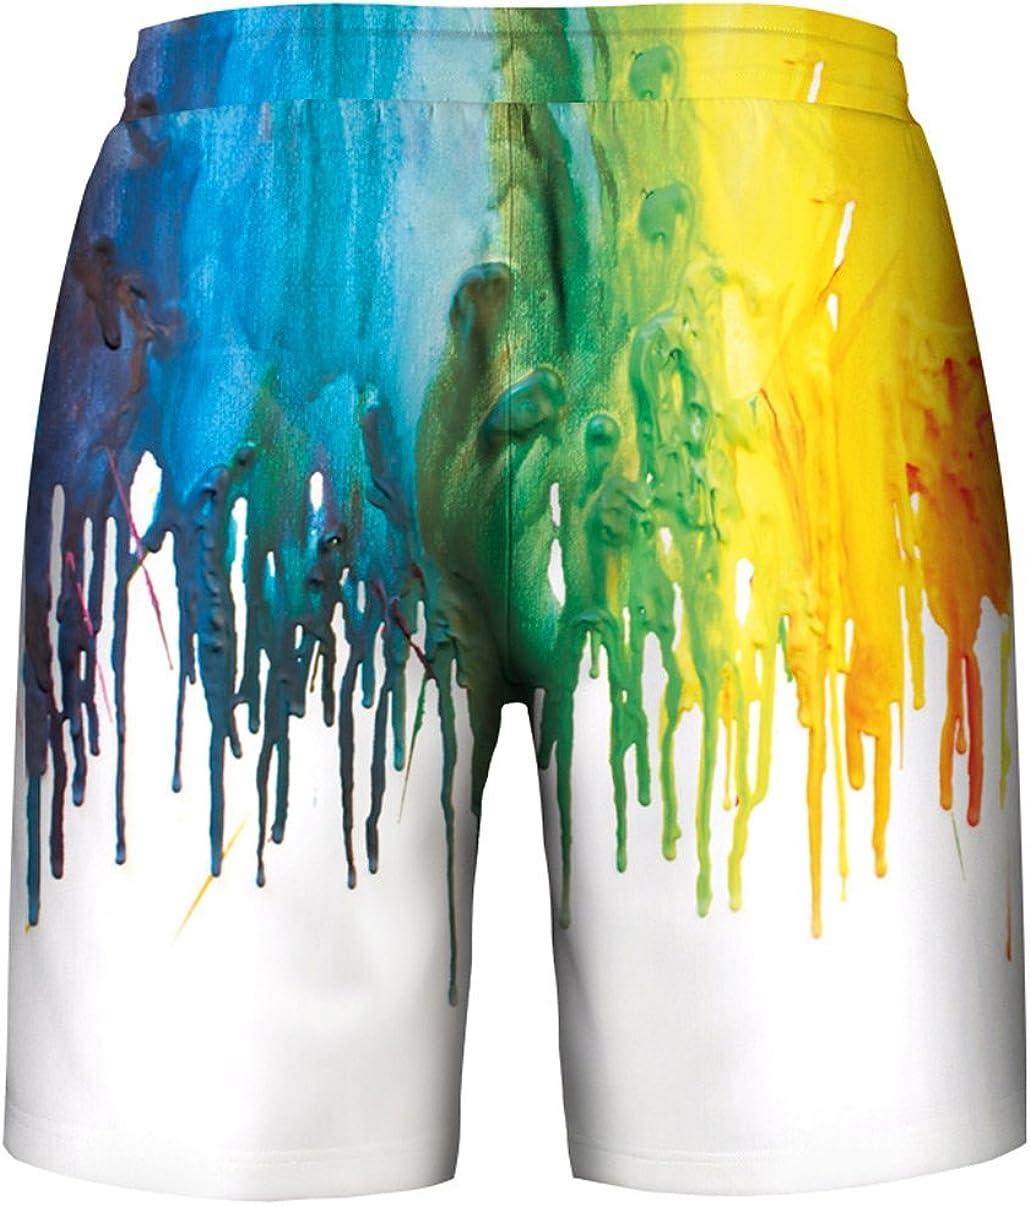 Aieoe Mens Unisex 3D Print Shorts Casual Drawstring Pocket Shorts Pants